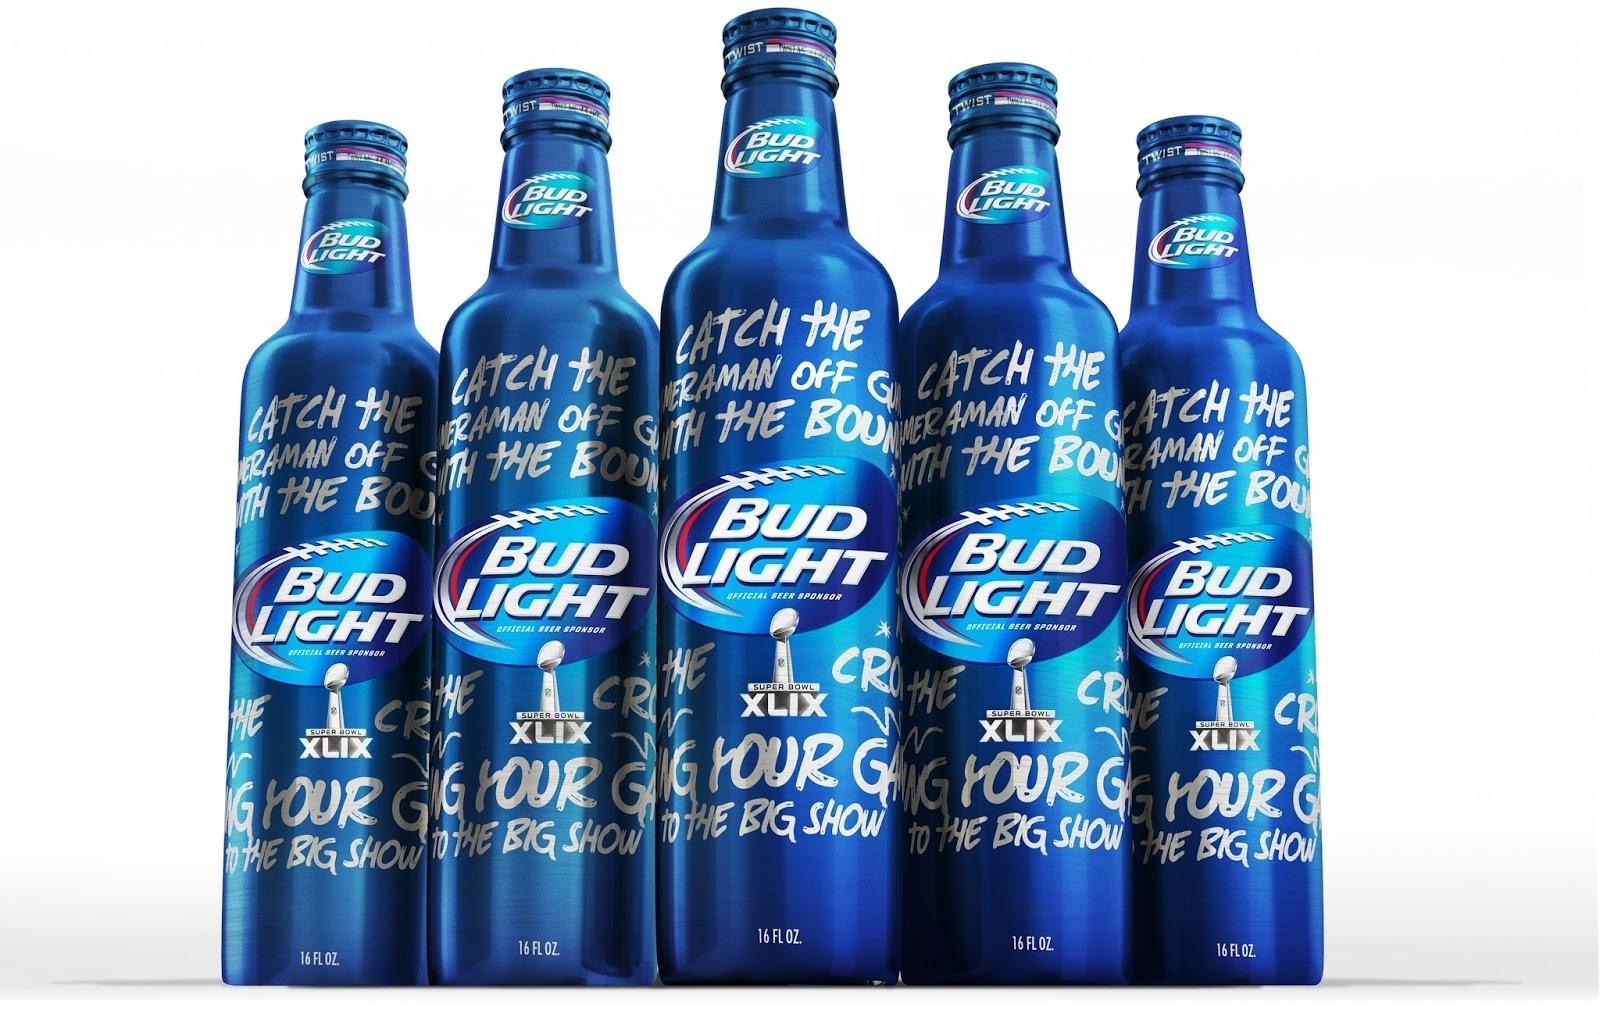 Bud Light Super Bowl Xlix Limited Edition Bottle On pertaining to Bud Light Super Bowl